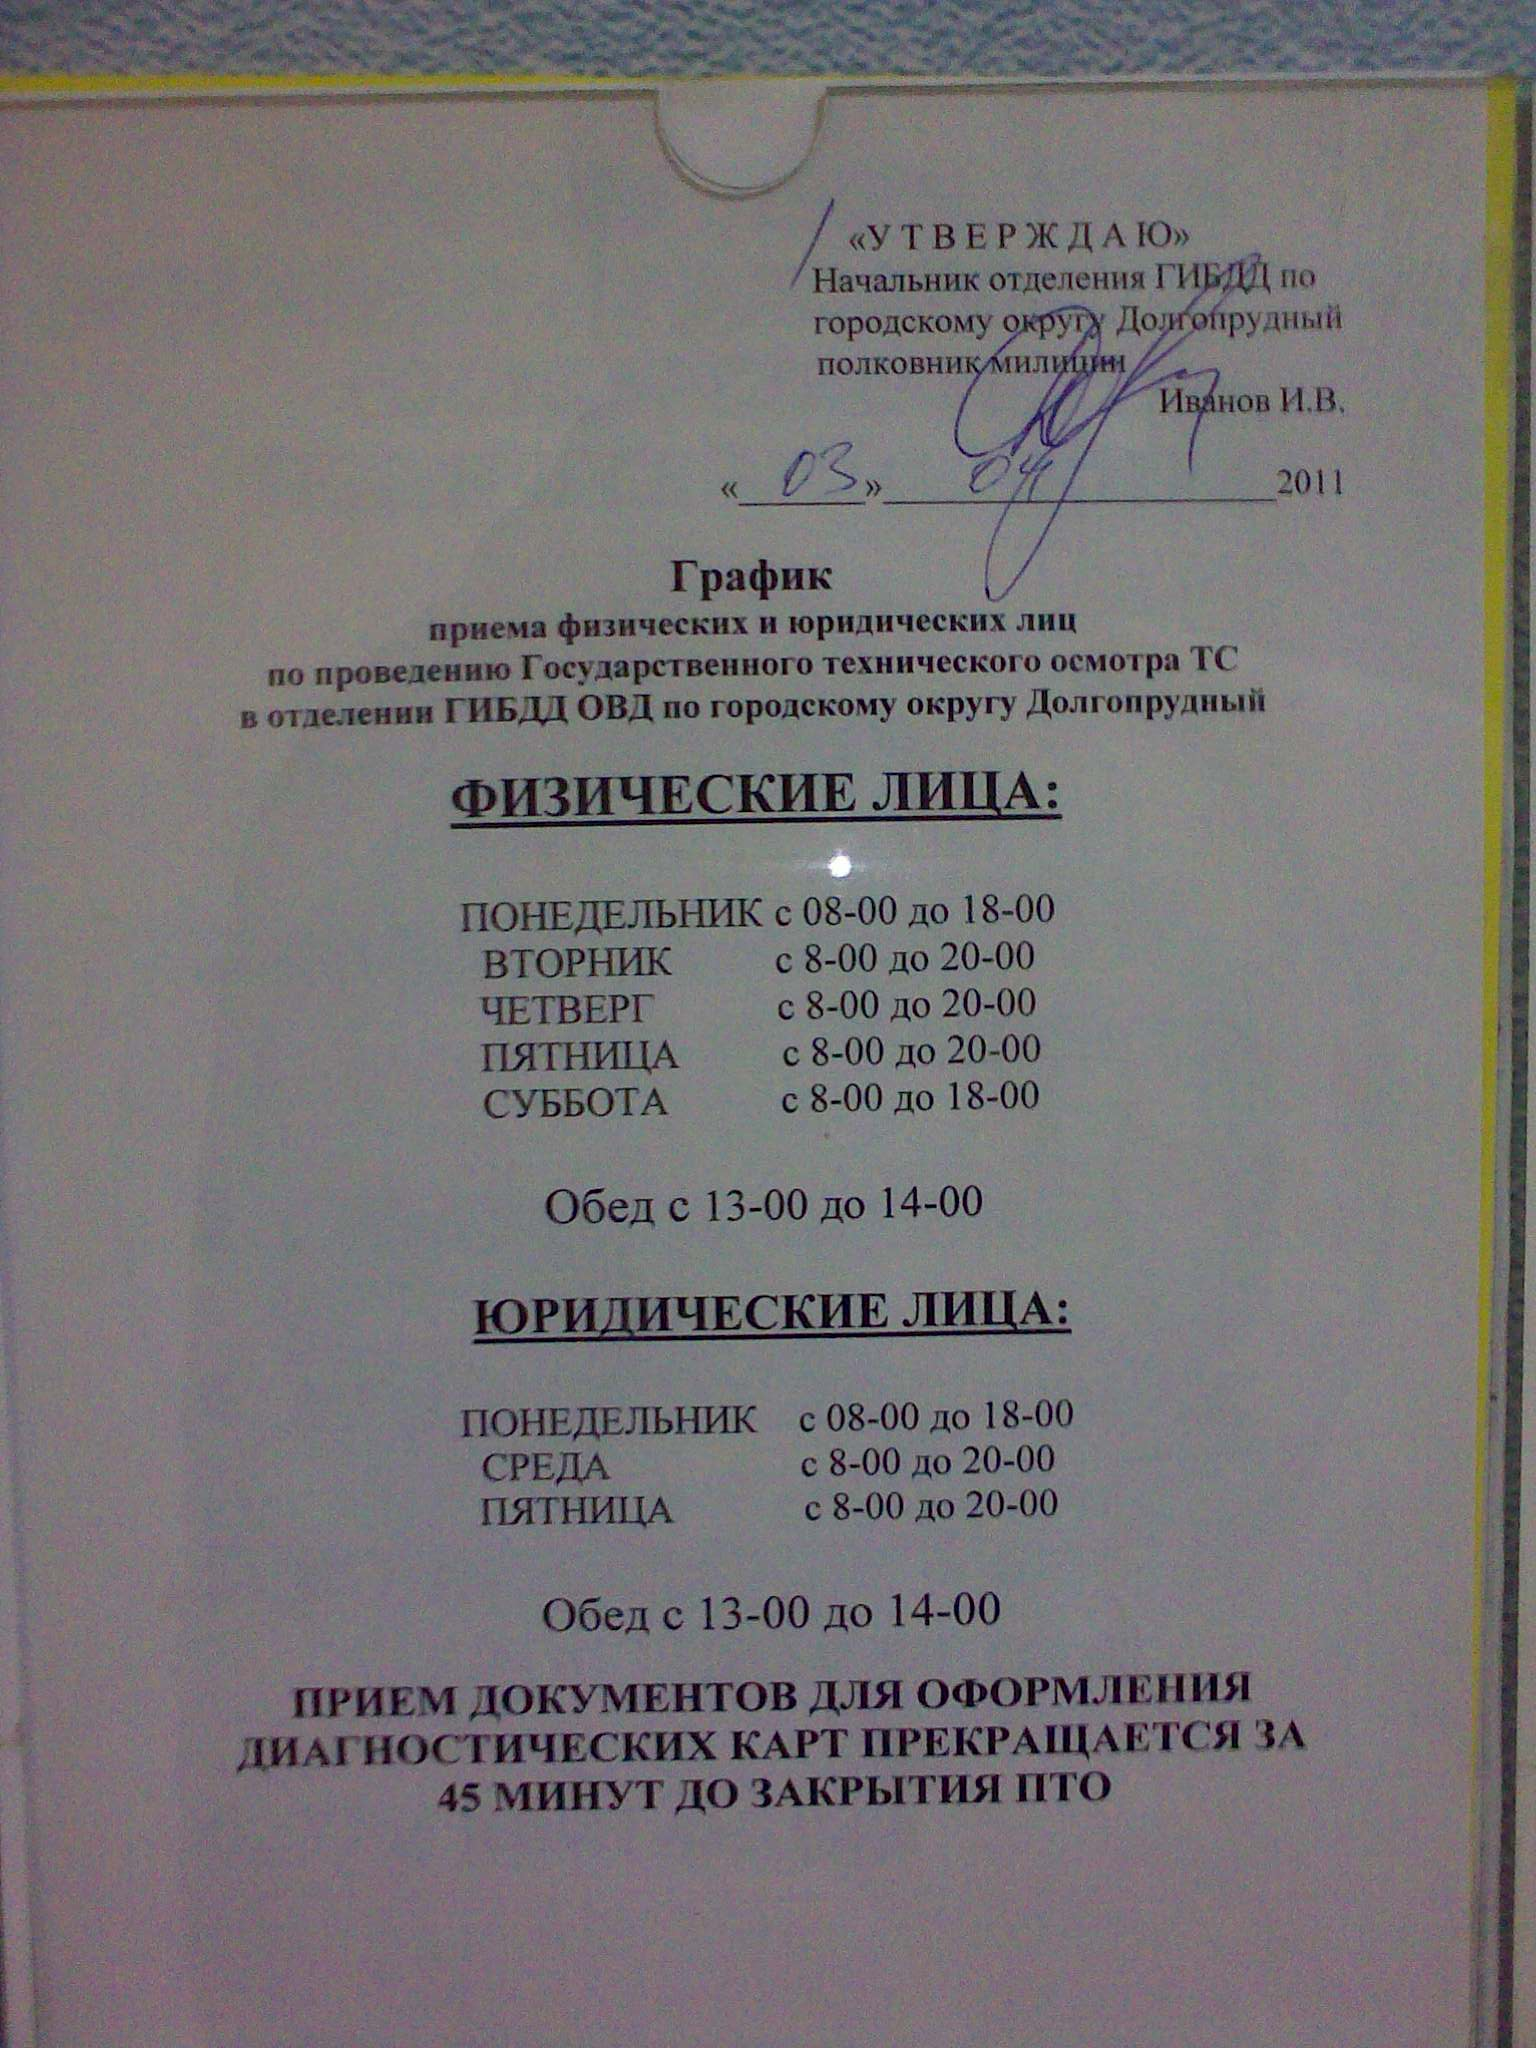 http://forum.darnet.ru/img_attach/761.jpg